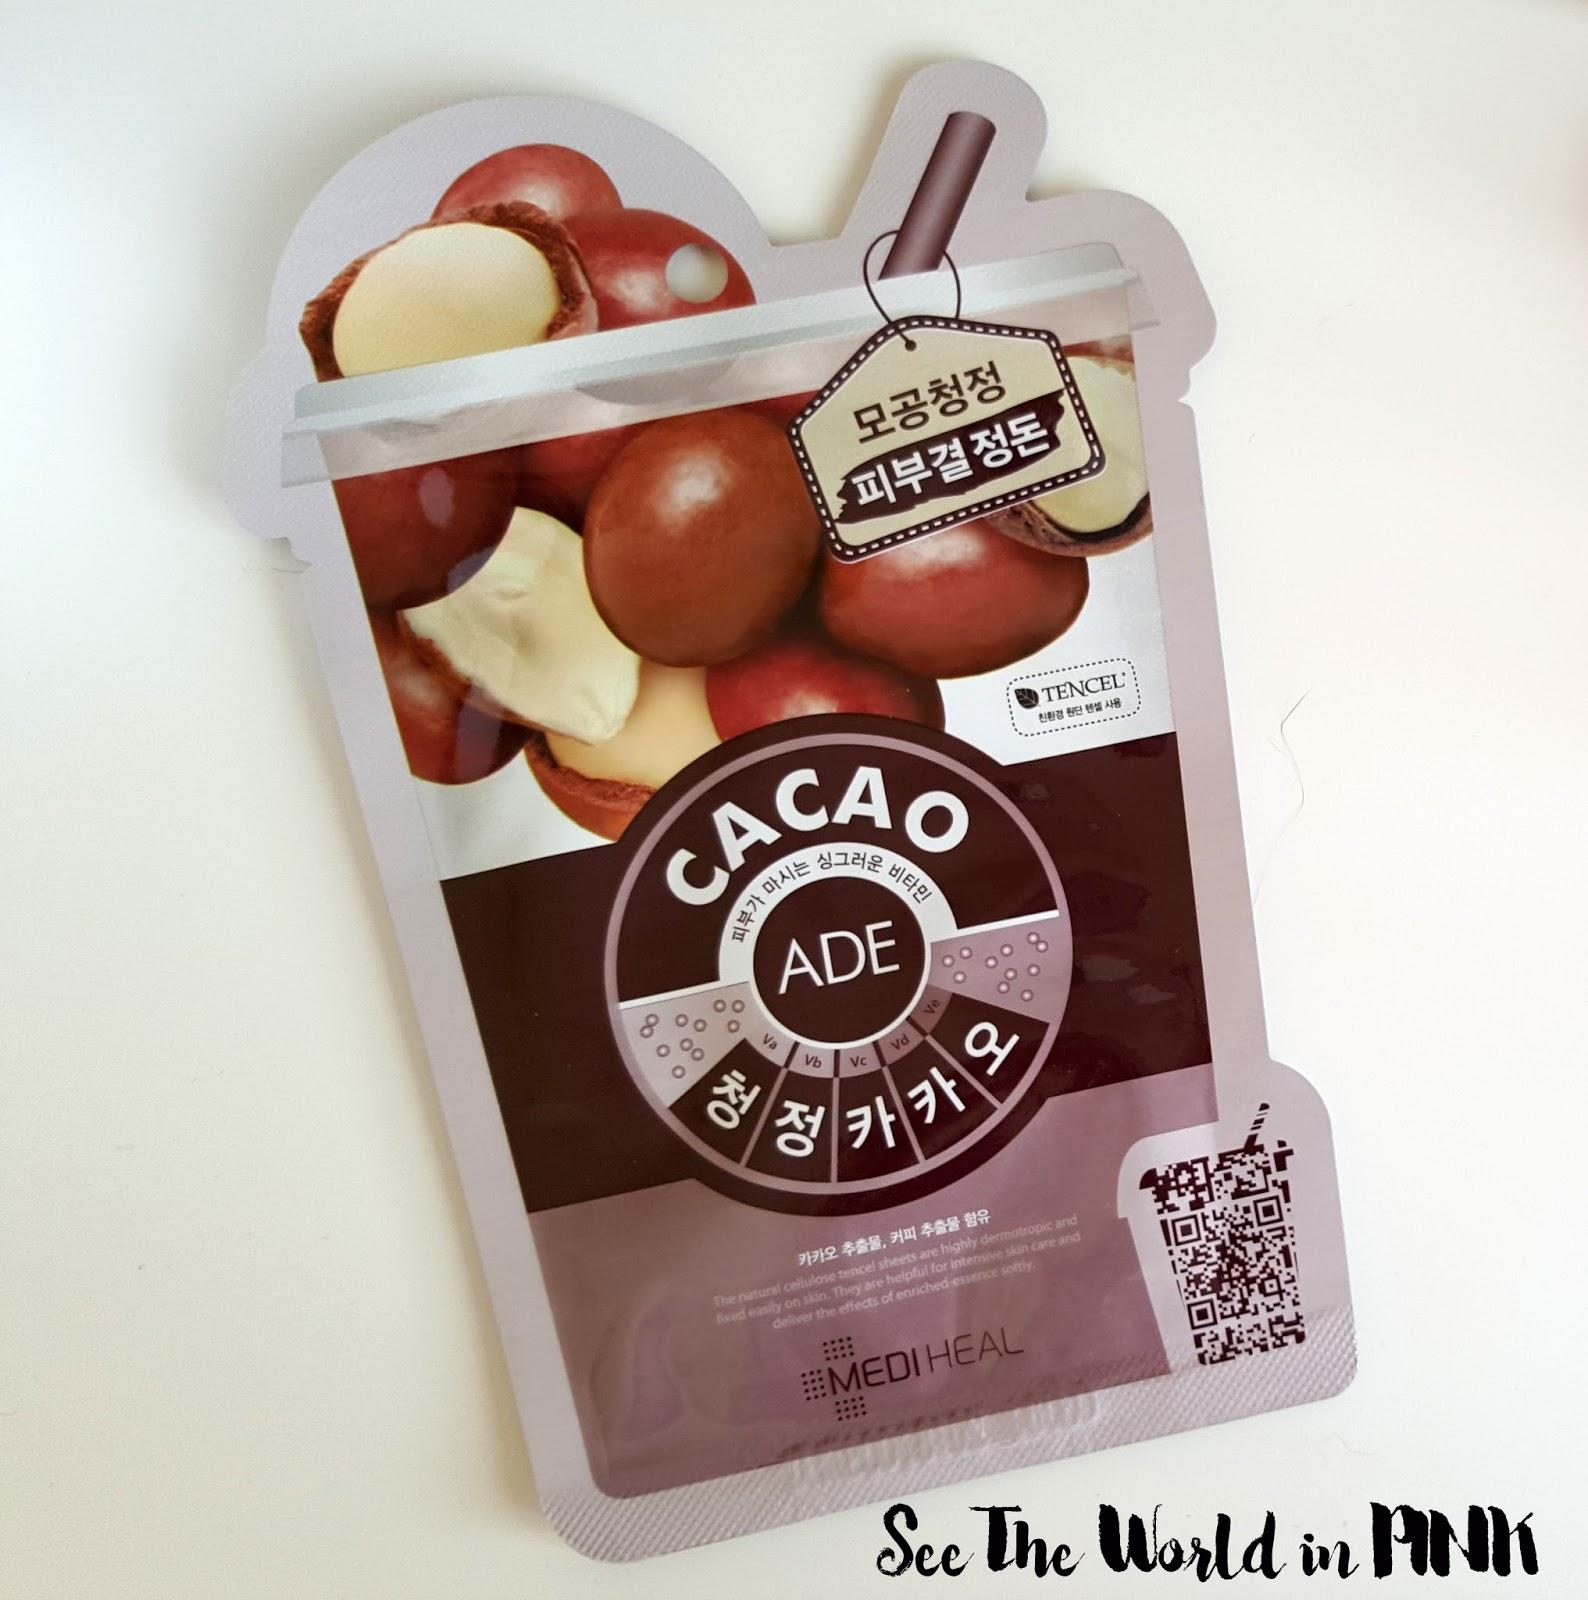 Beauty Clinic Mediheal Cacao (Cocoa) Ade Mask